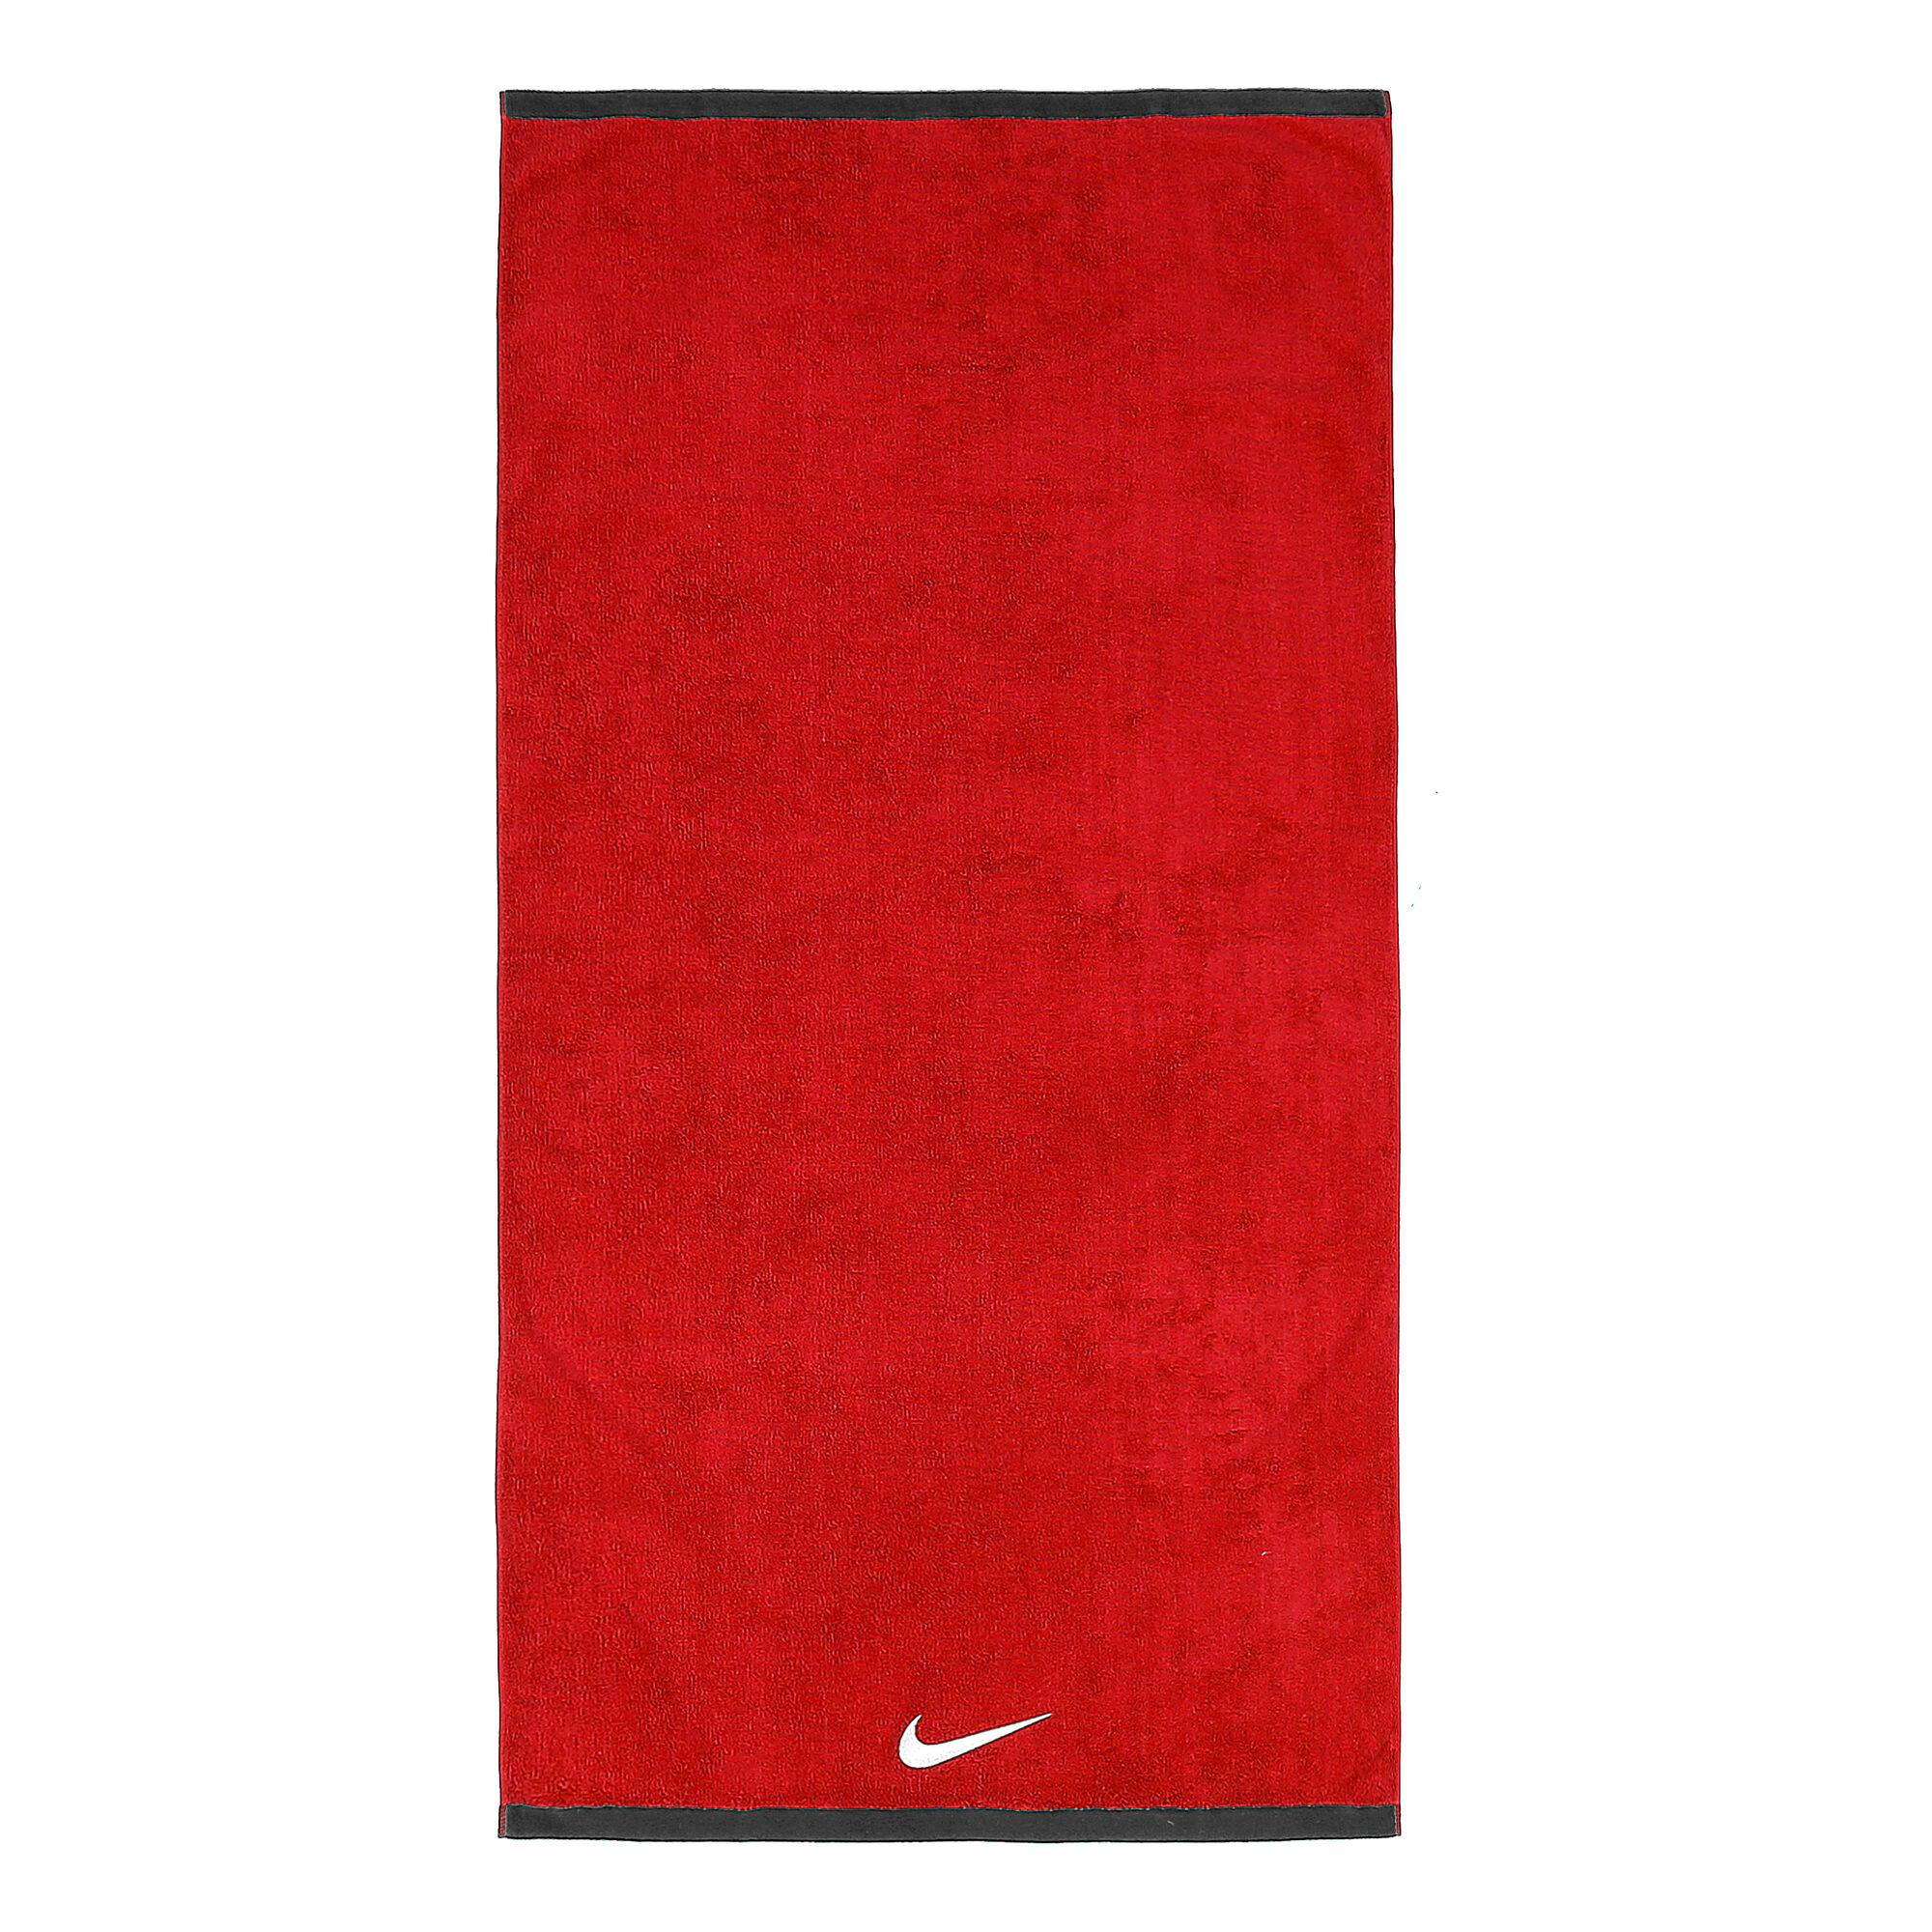 f1567cfb buy Nike Fundamental Towel 60x120cm - Red, Black online   Jogging-Point